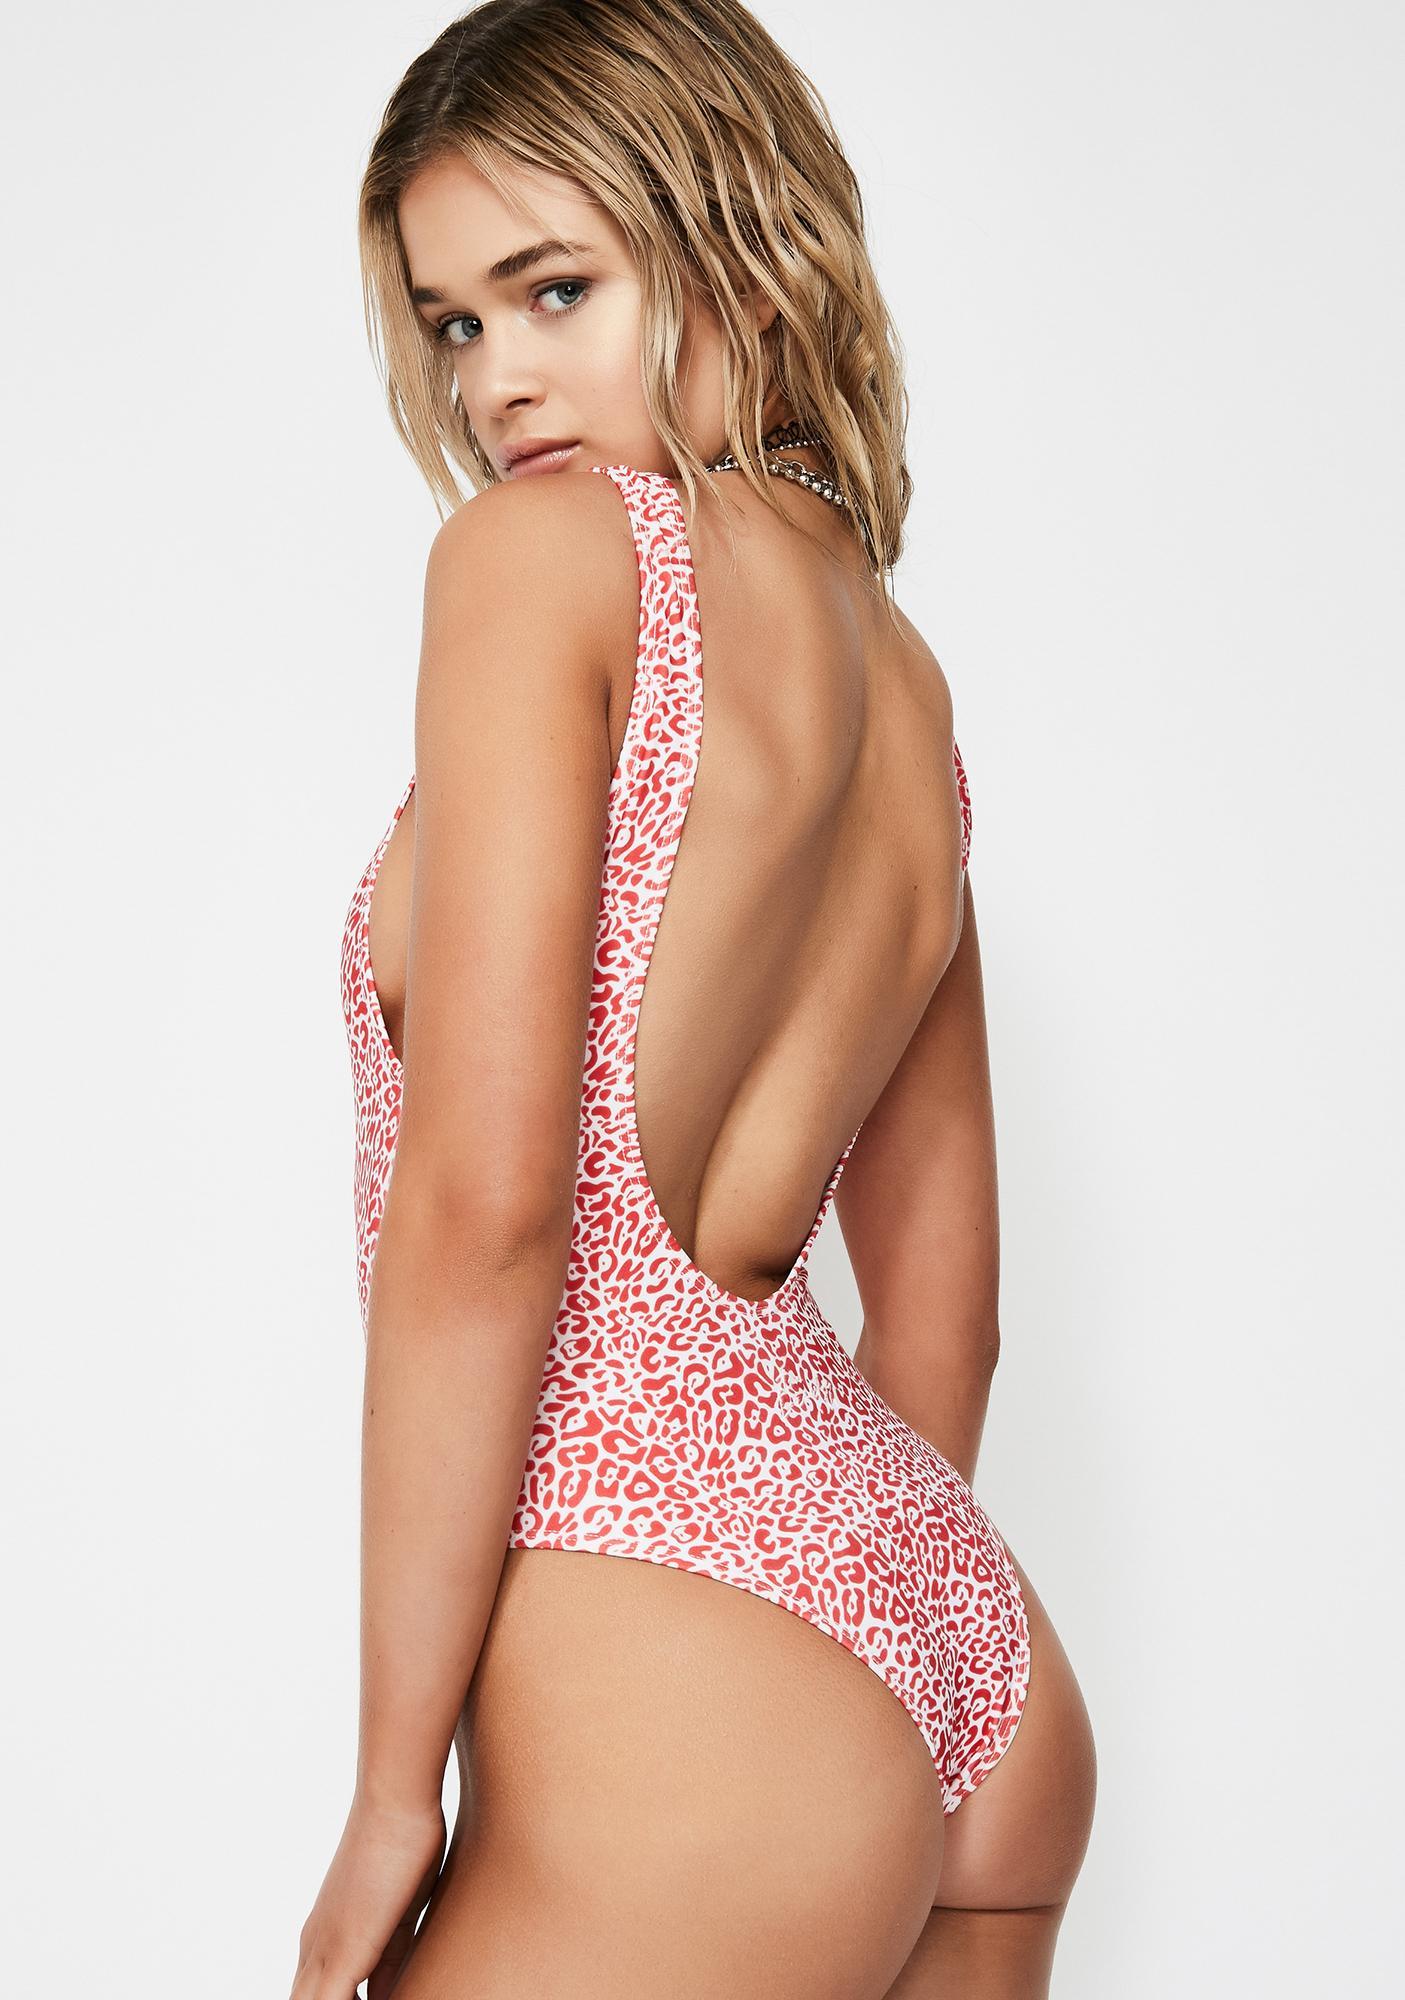 The People VS Leopard Red Juju One Piece Swimsuit